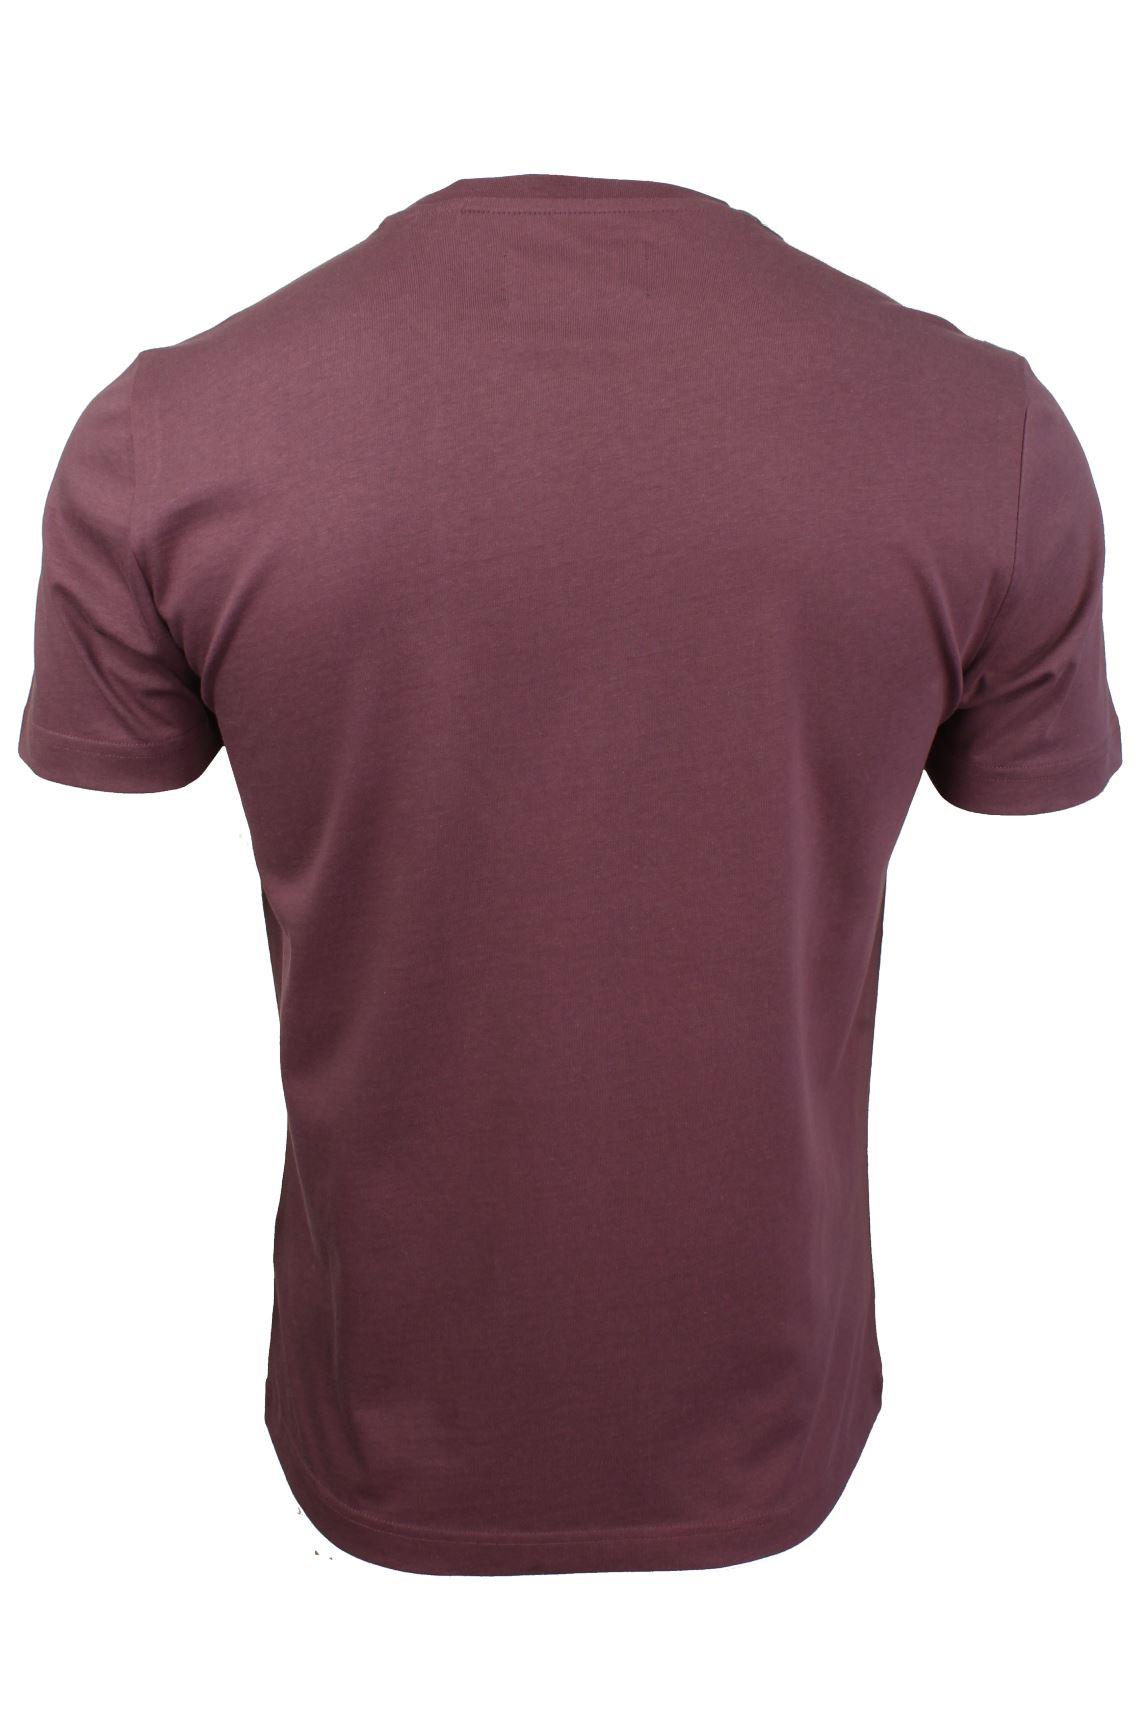 Mens-T-Shirt-by-Original-Penguin-Crew-Neck-Short-Sleeved thumbnail 35